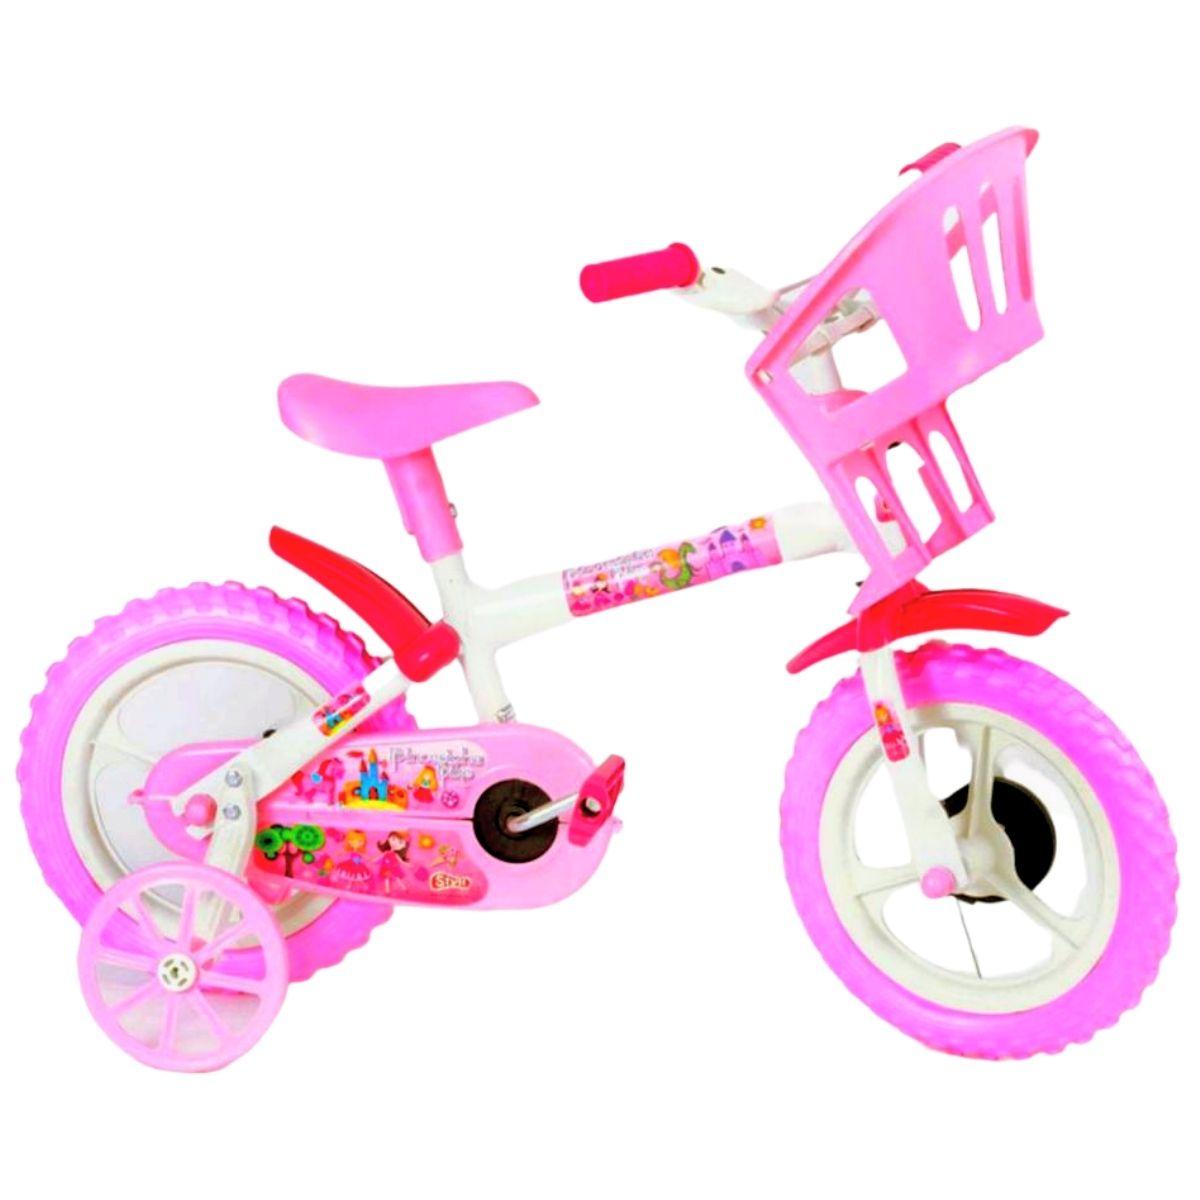 Bicicleta Infantil Styll Baby Princesinhas Aro 12 Freio Tambor Cor Rosa/branco